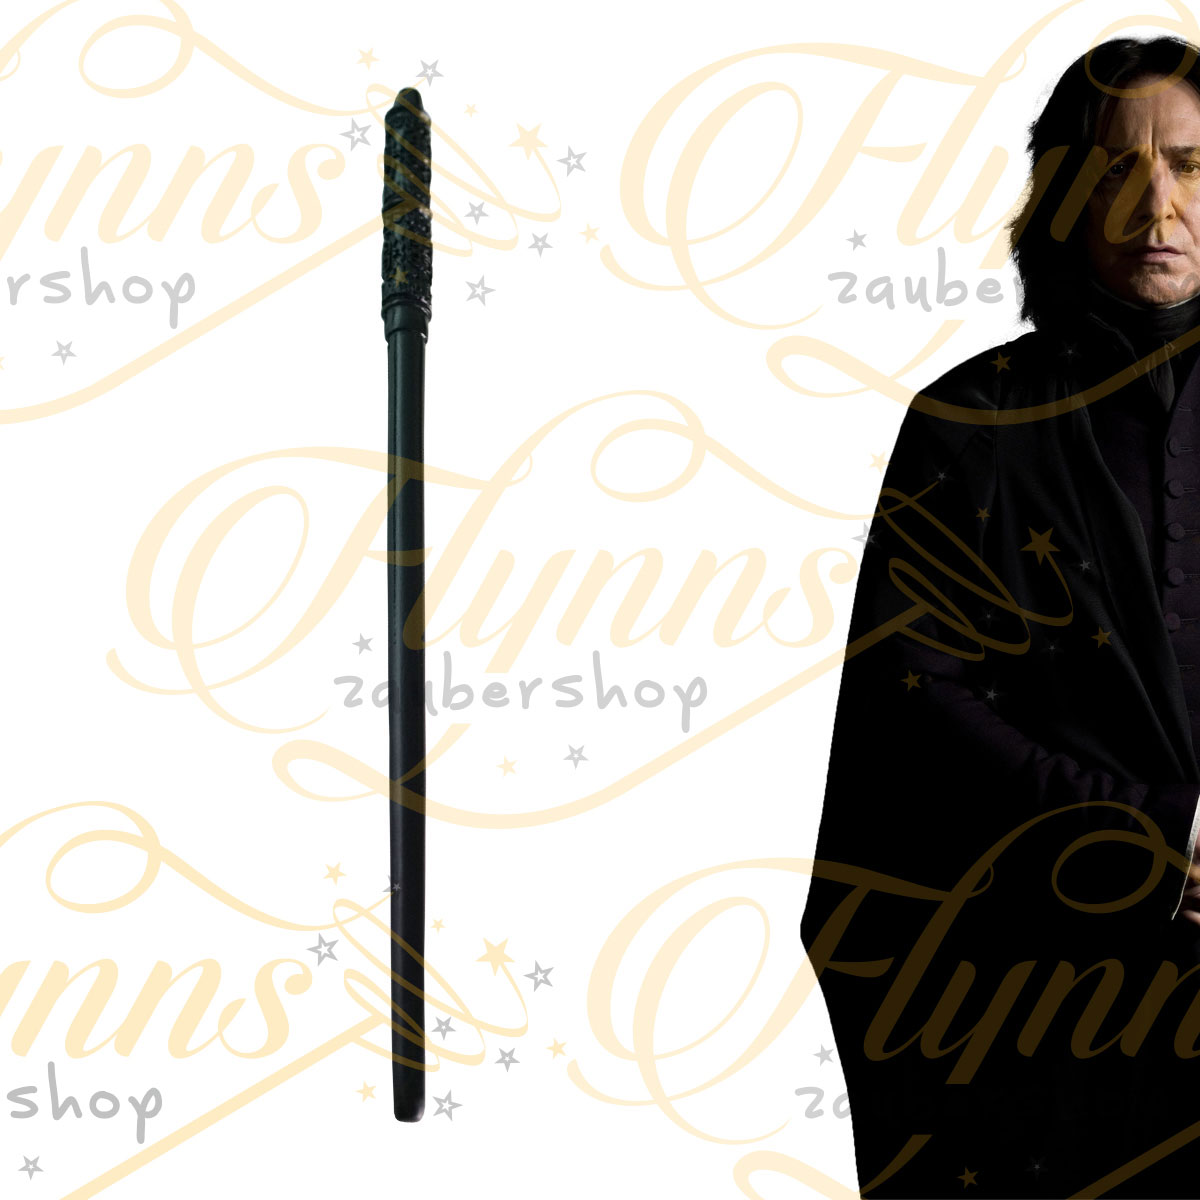 Severus Snape | Harry Potter | Flynns Zaubershop